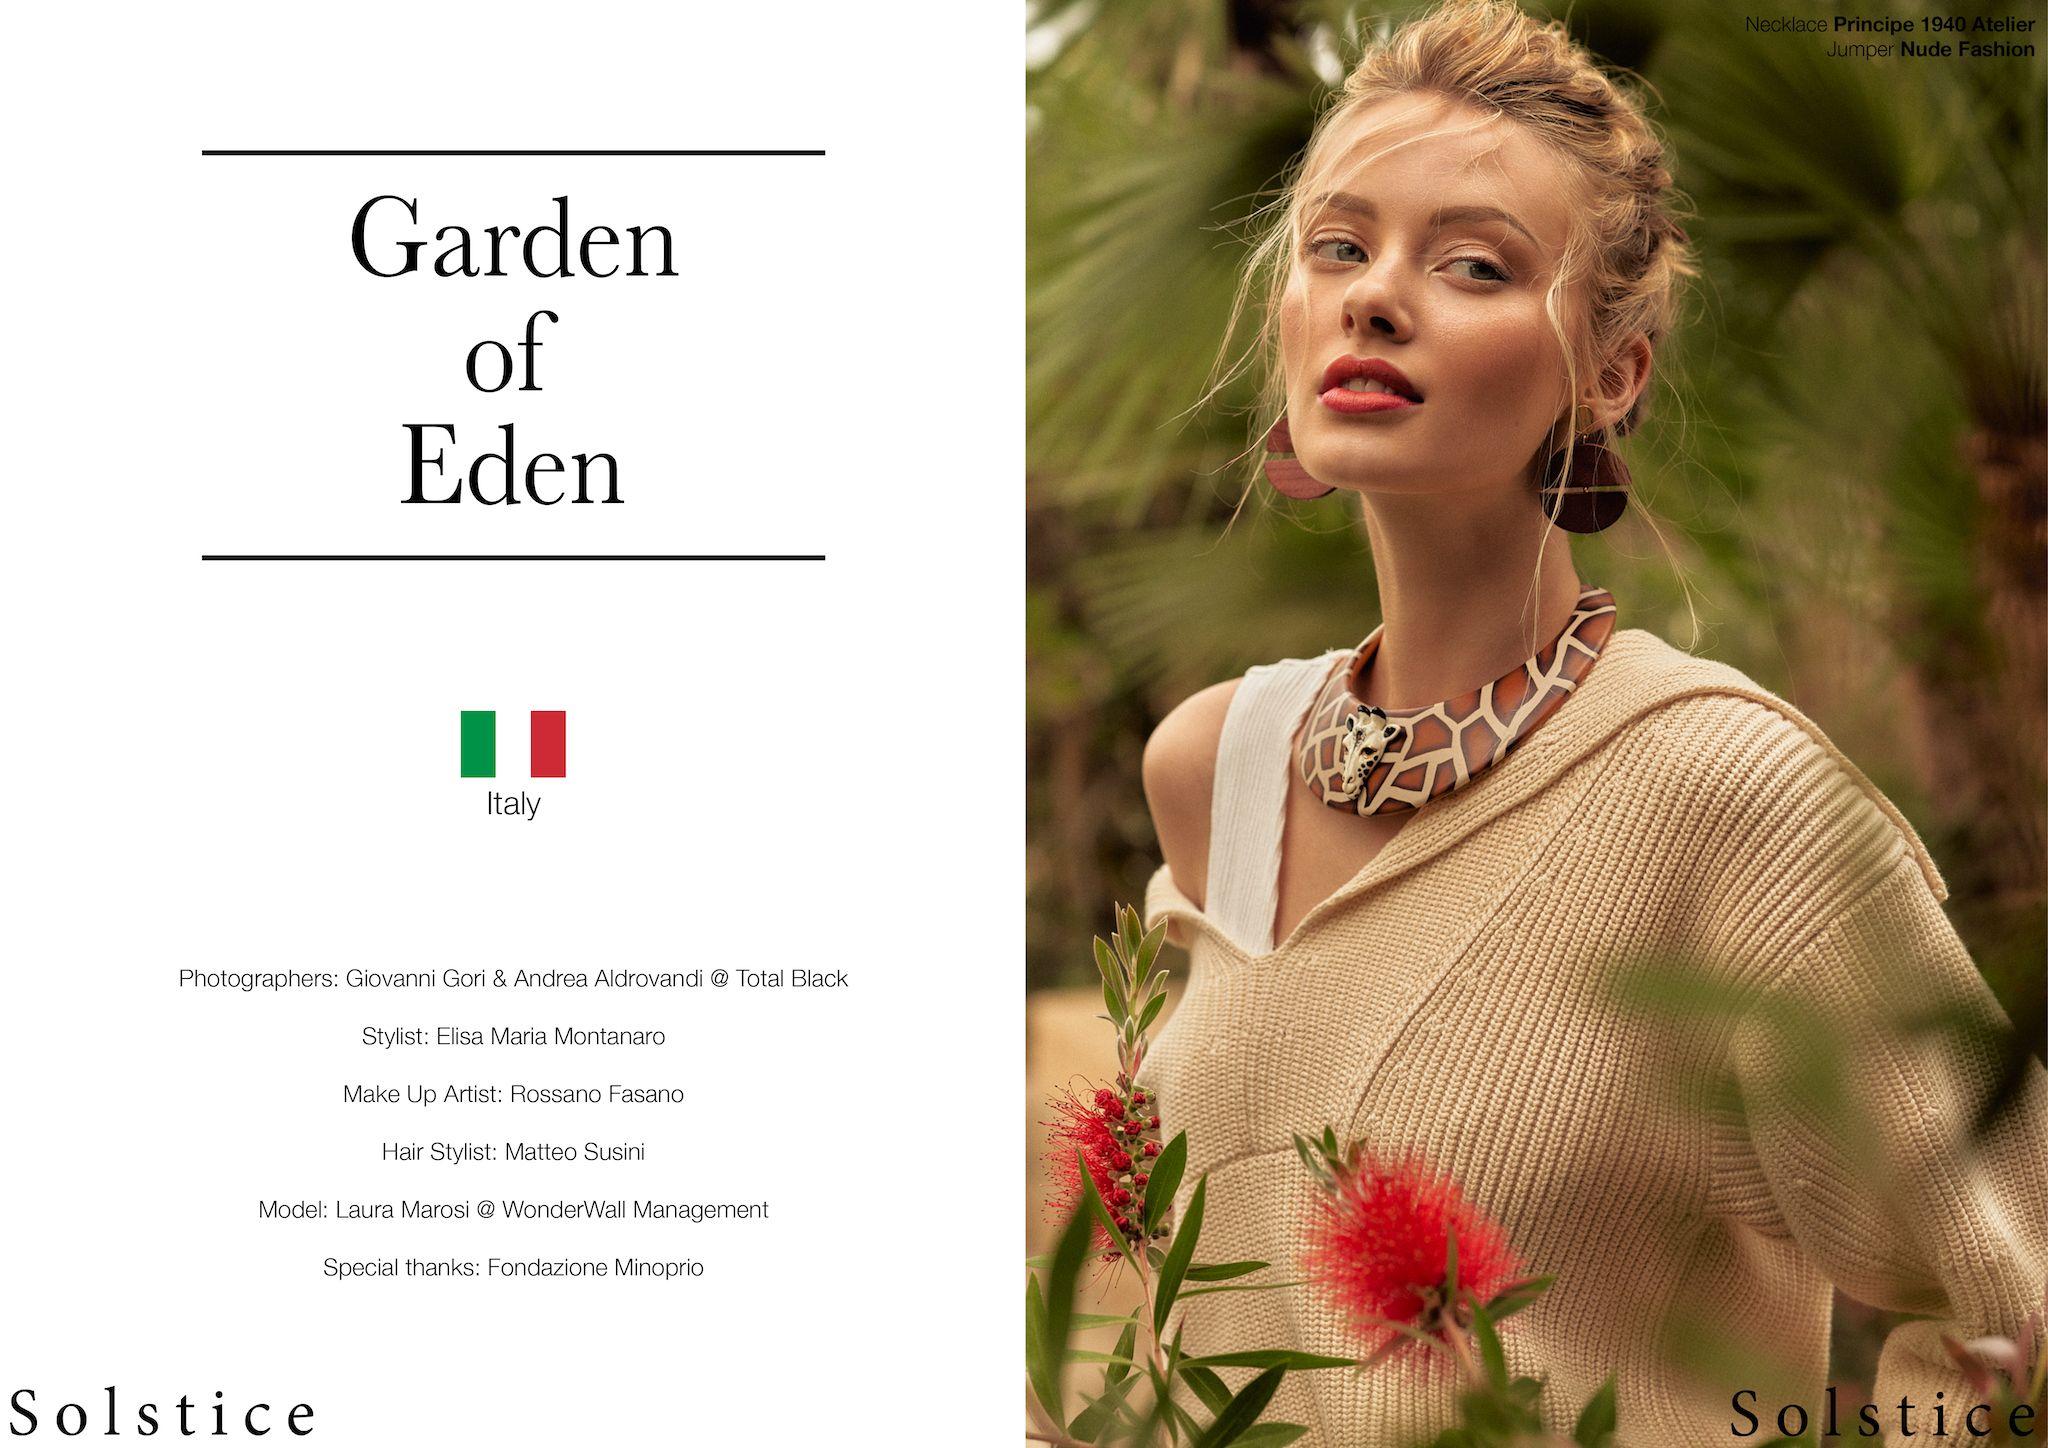 Garden of Eden - Solstice Magazine UK - Pic. 1